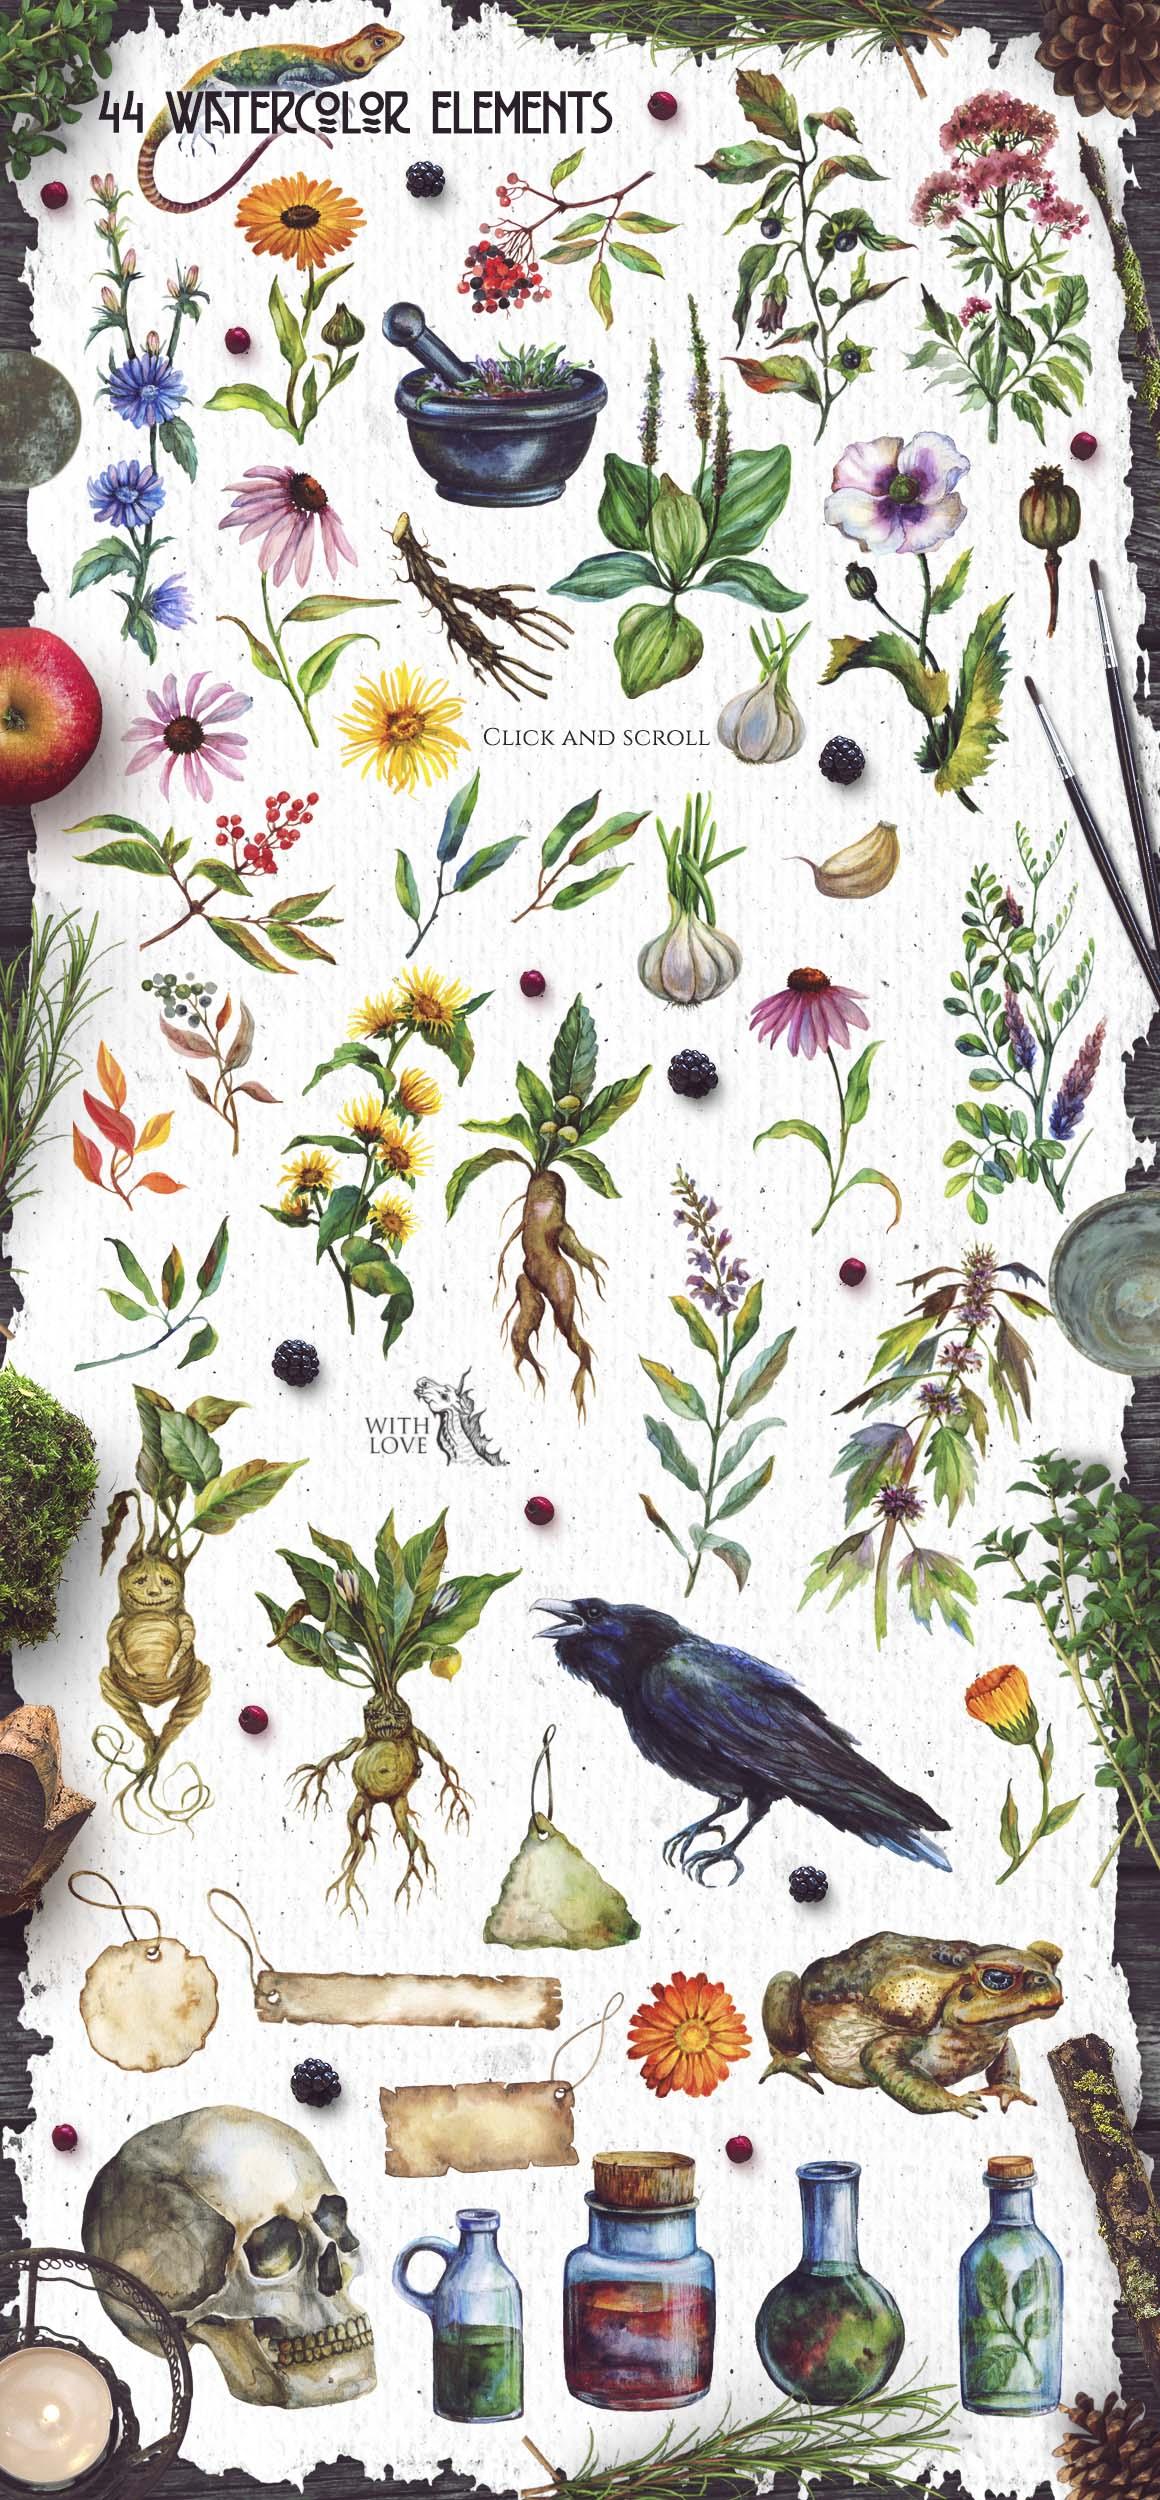 Watercolor Alchemy Medicinal Herbs example image 4